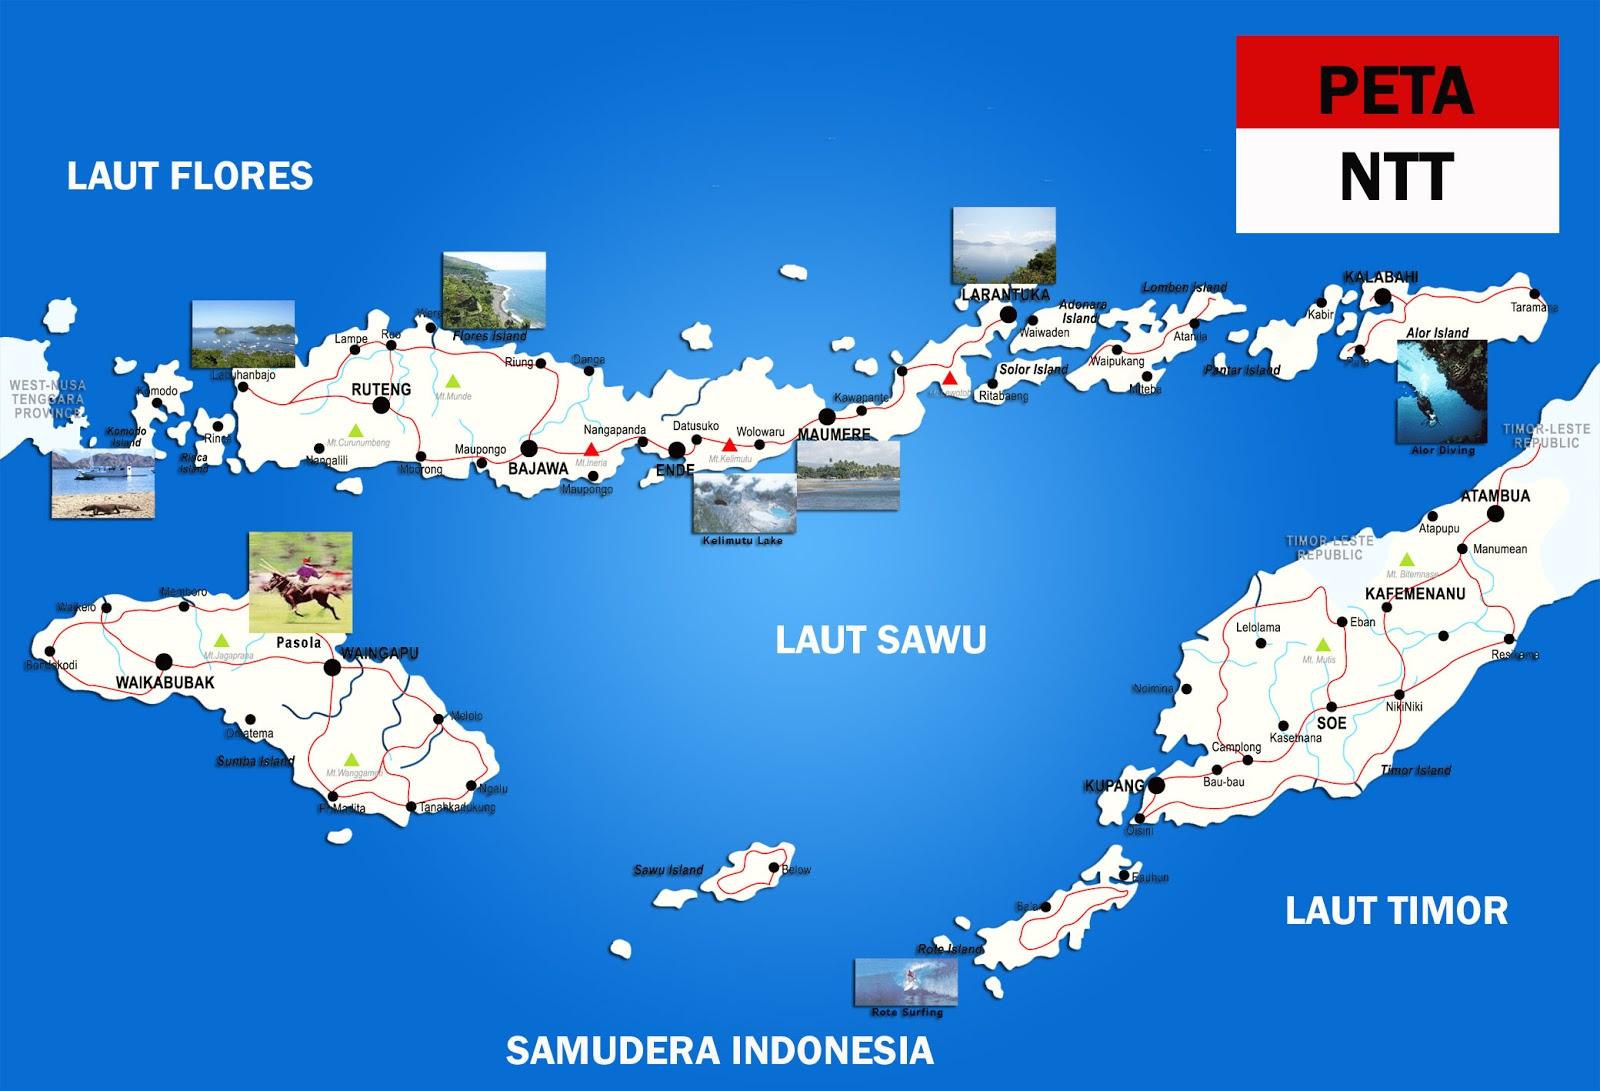 Peta NTT lengkap 21 Kabupaten 1 Kota - Sejarah Negara Com